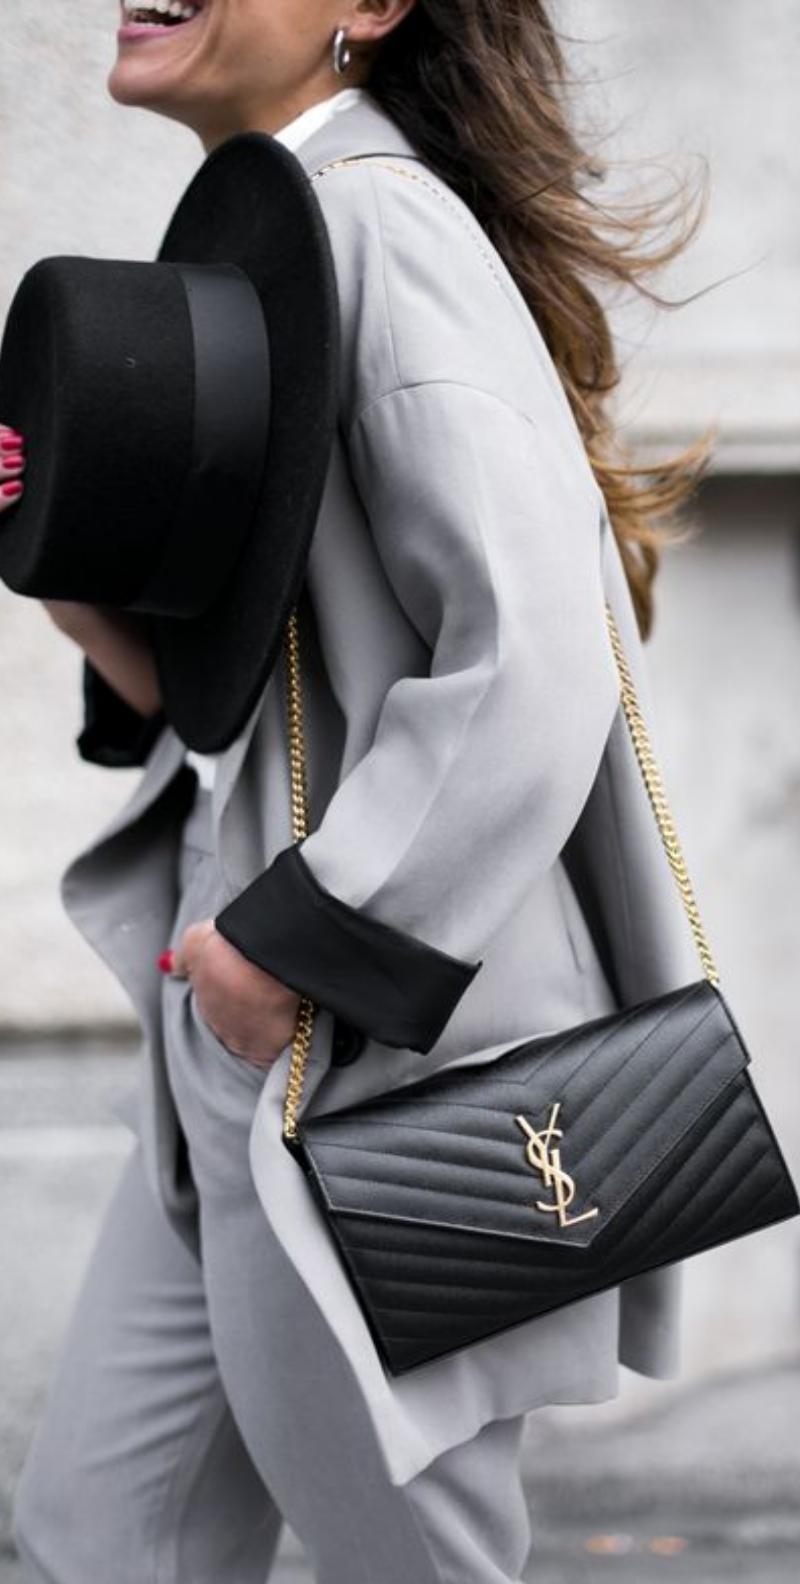 Yves Saint Laurent Chic Saint Laurent Handbags Bags Shoulder Bag